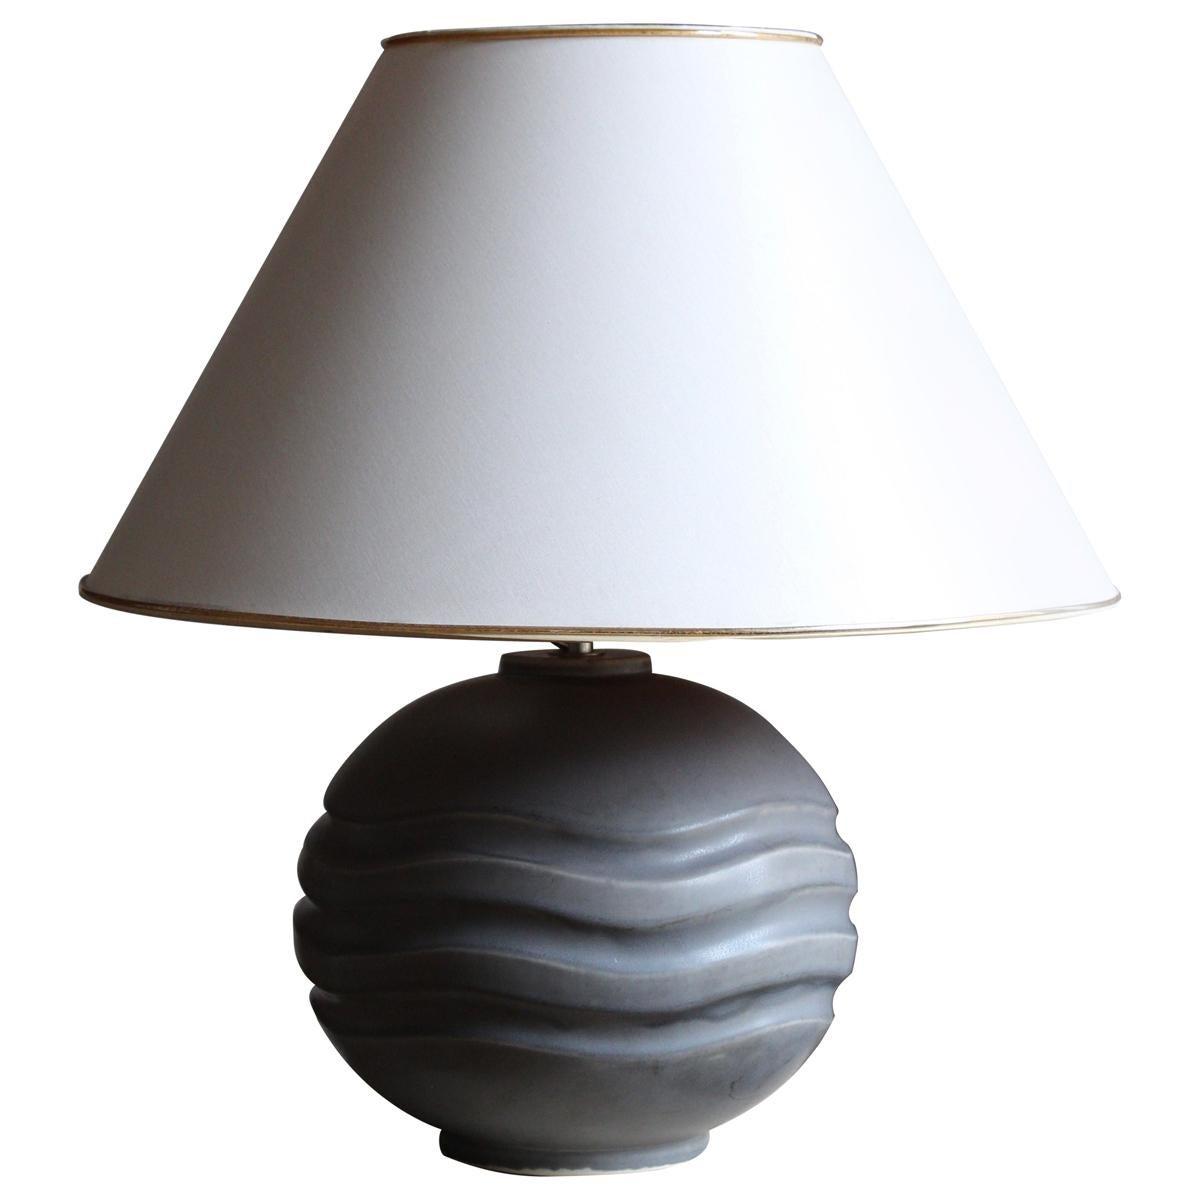 Gertrud Lönegren, Large Table Lamp, Glazed Stoneware, Rörstrand, 1950s